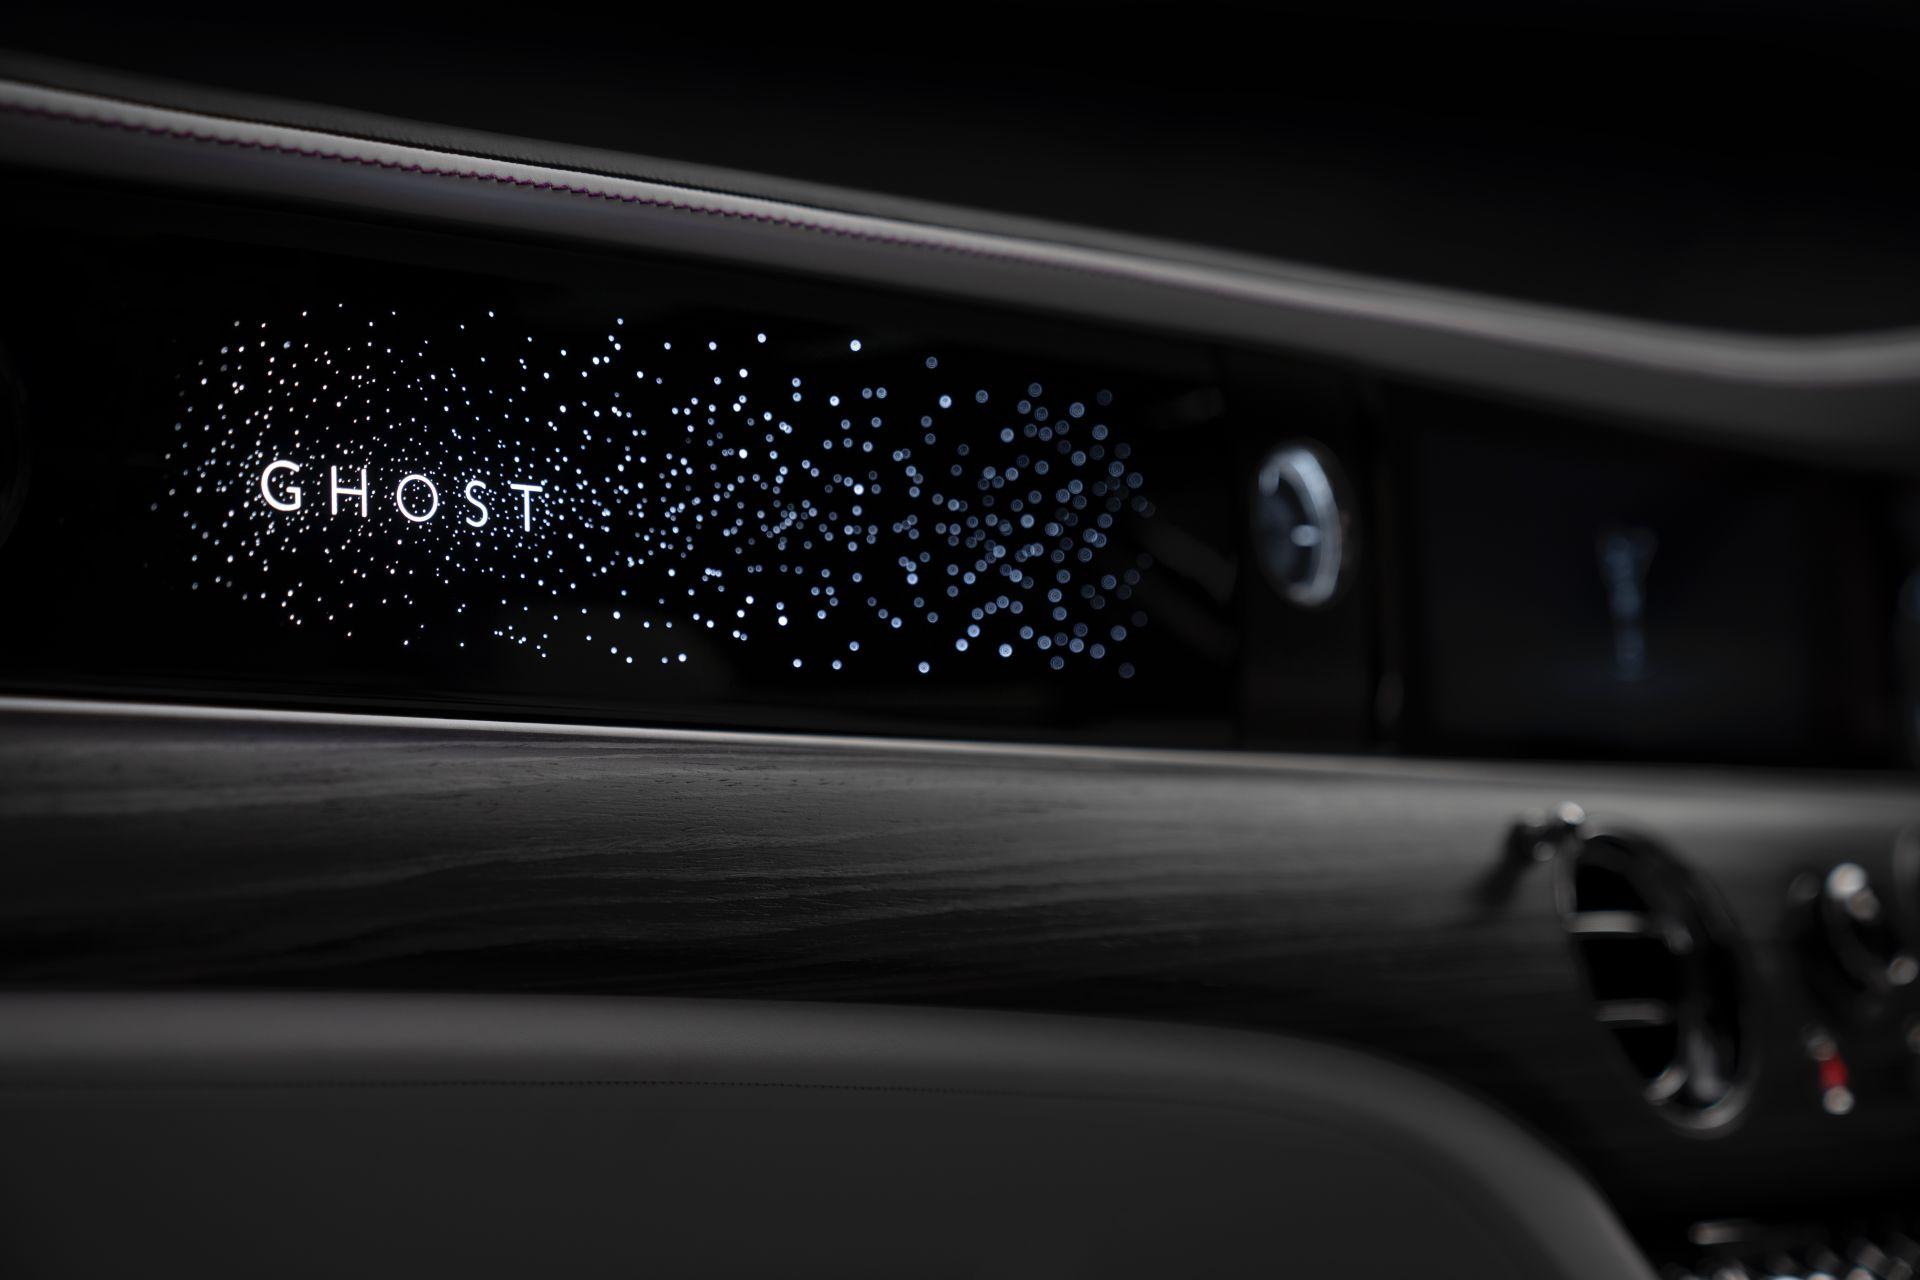 2021-Rolls-Royce-Ghost-illuminated-fascia